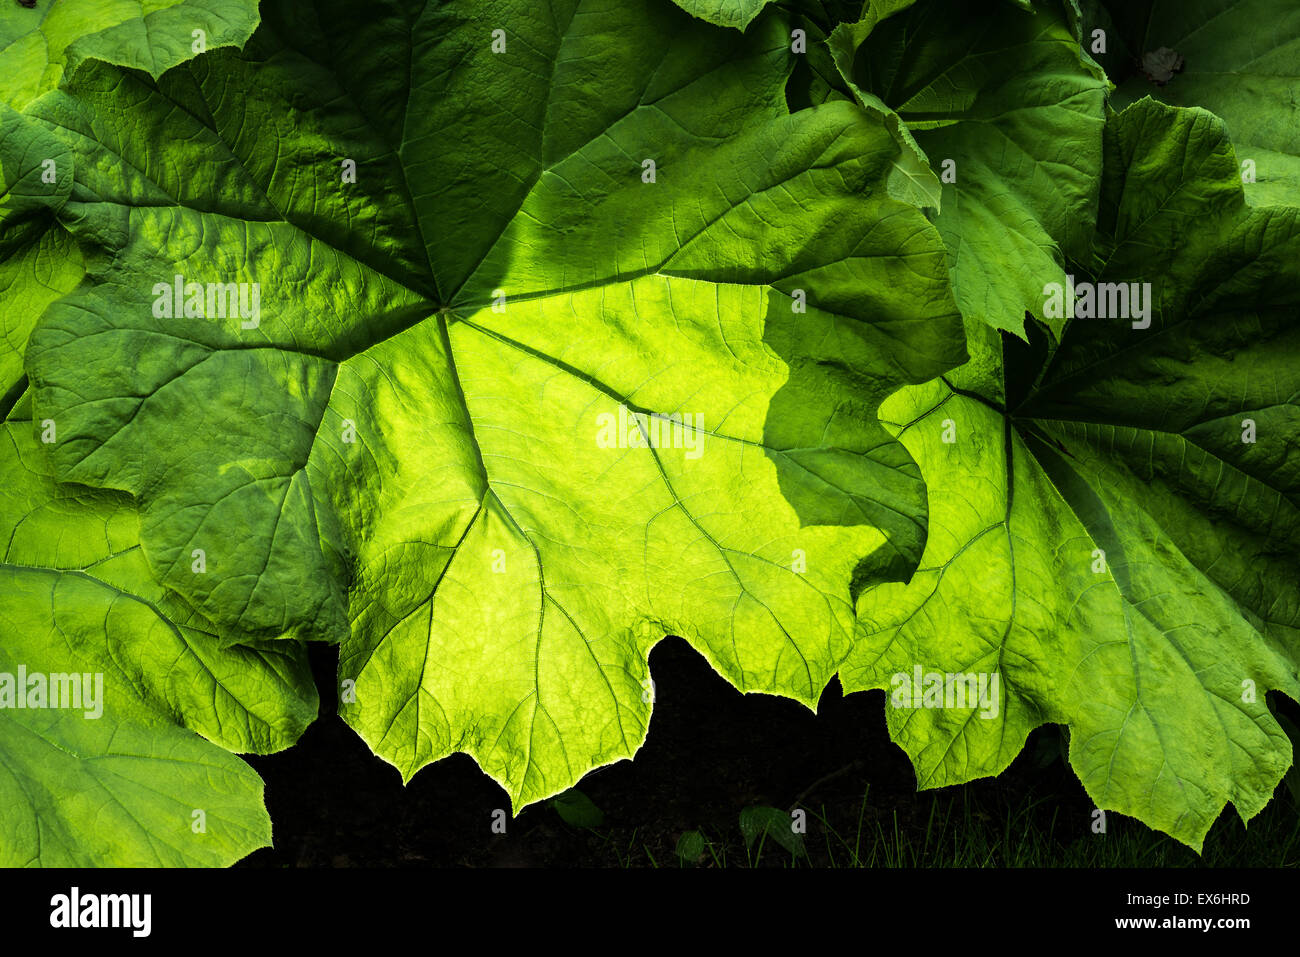 Saxifragaceae Astilboides tabularis foglio tabulare parasollblad swe Manciuria Corea del Nord Rodgersia tabularis Foto Stock